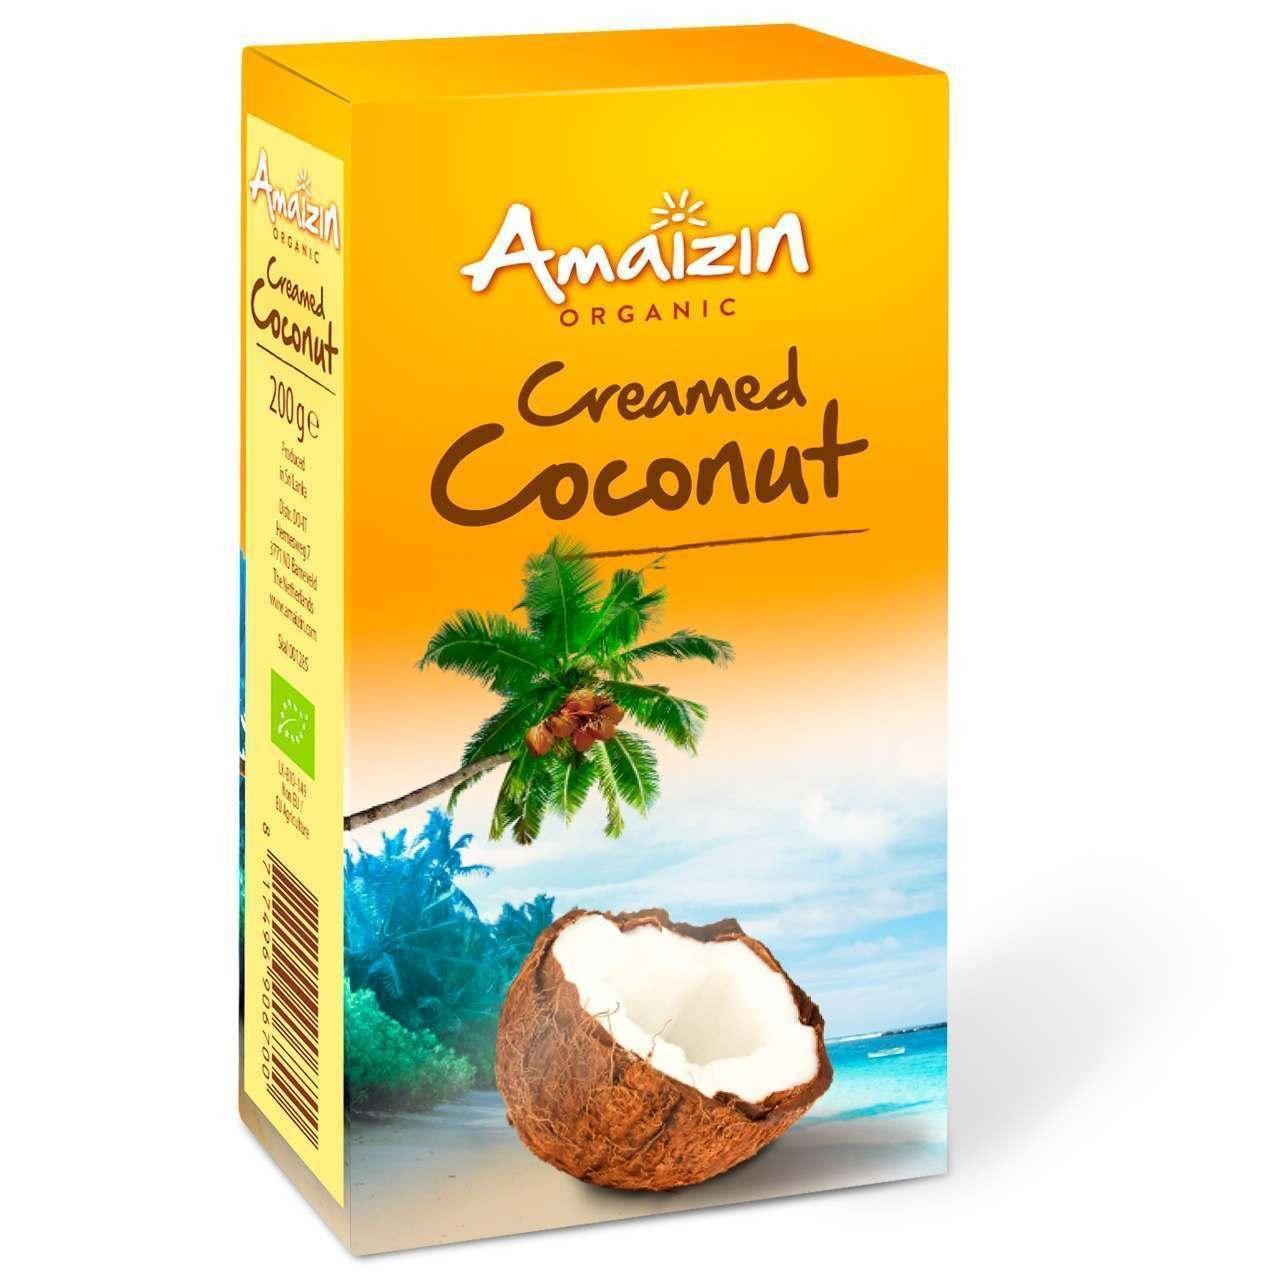 AMAIZIN CREAMED COCONUT